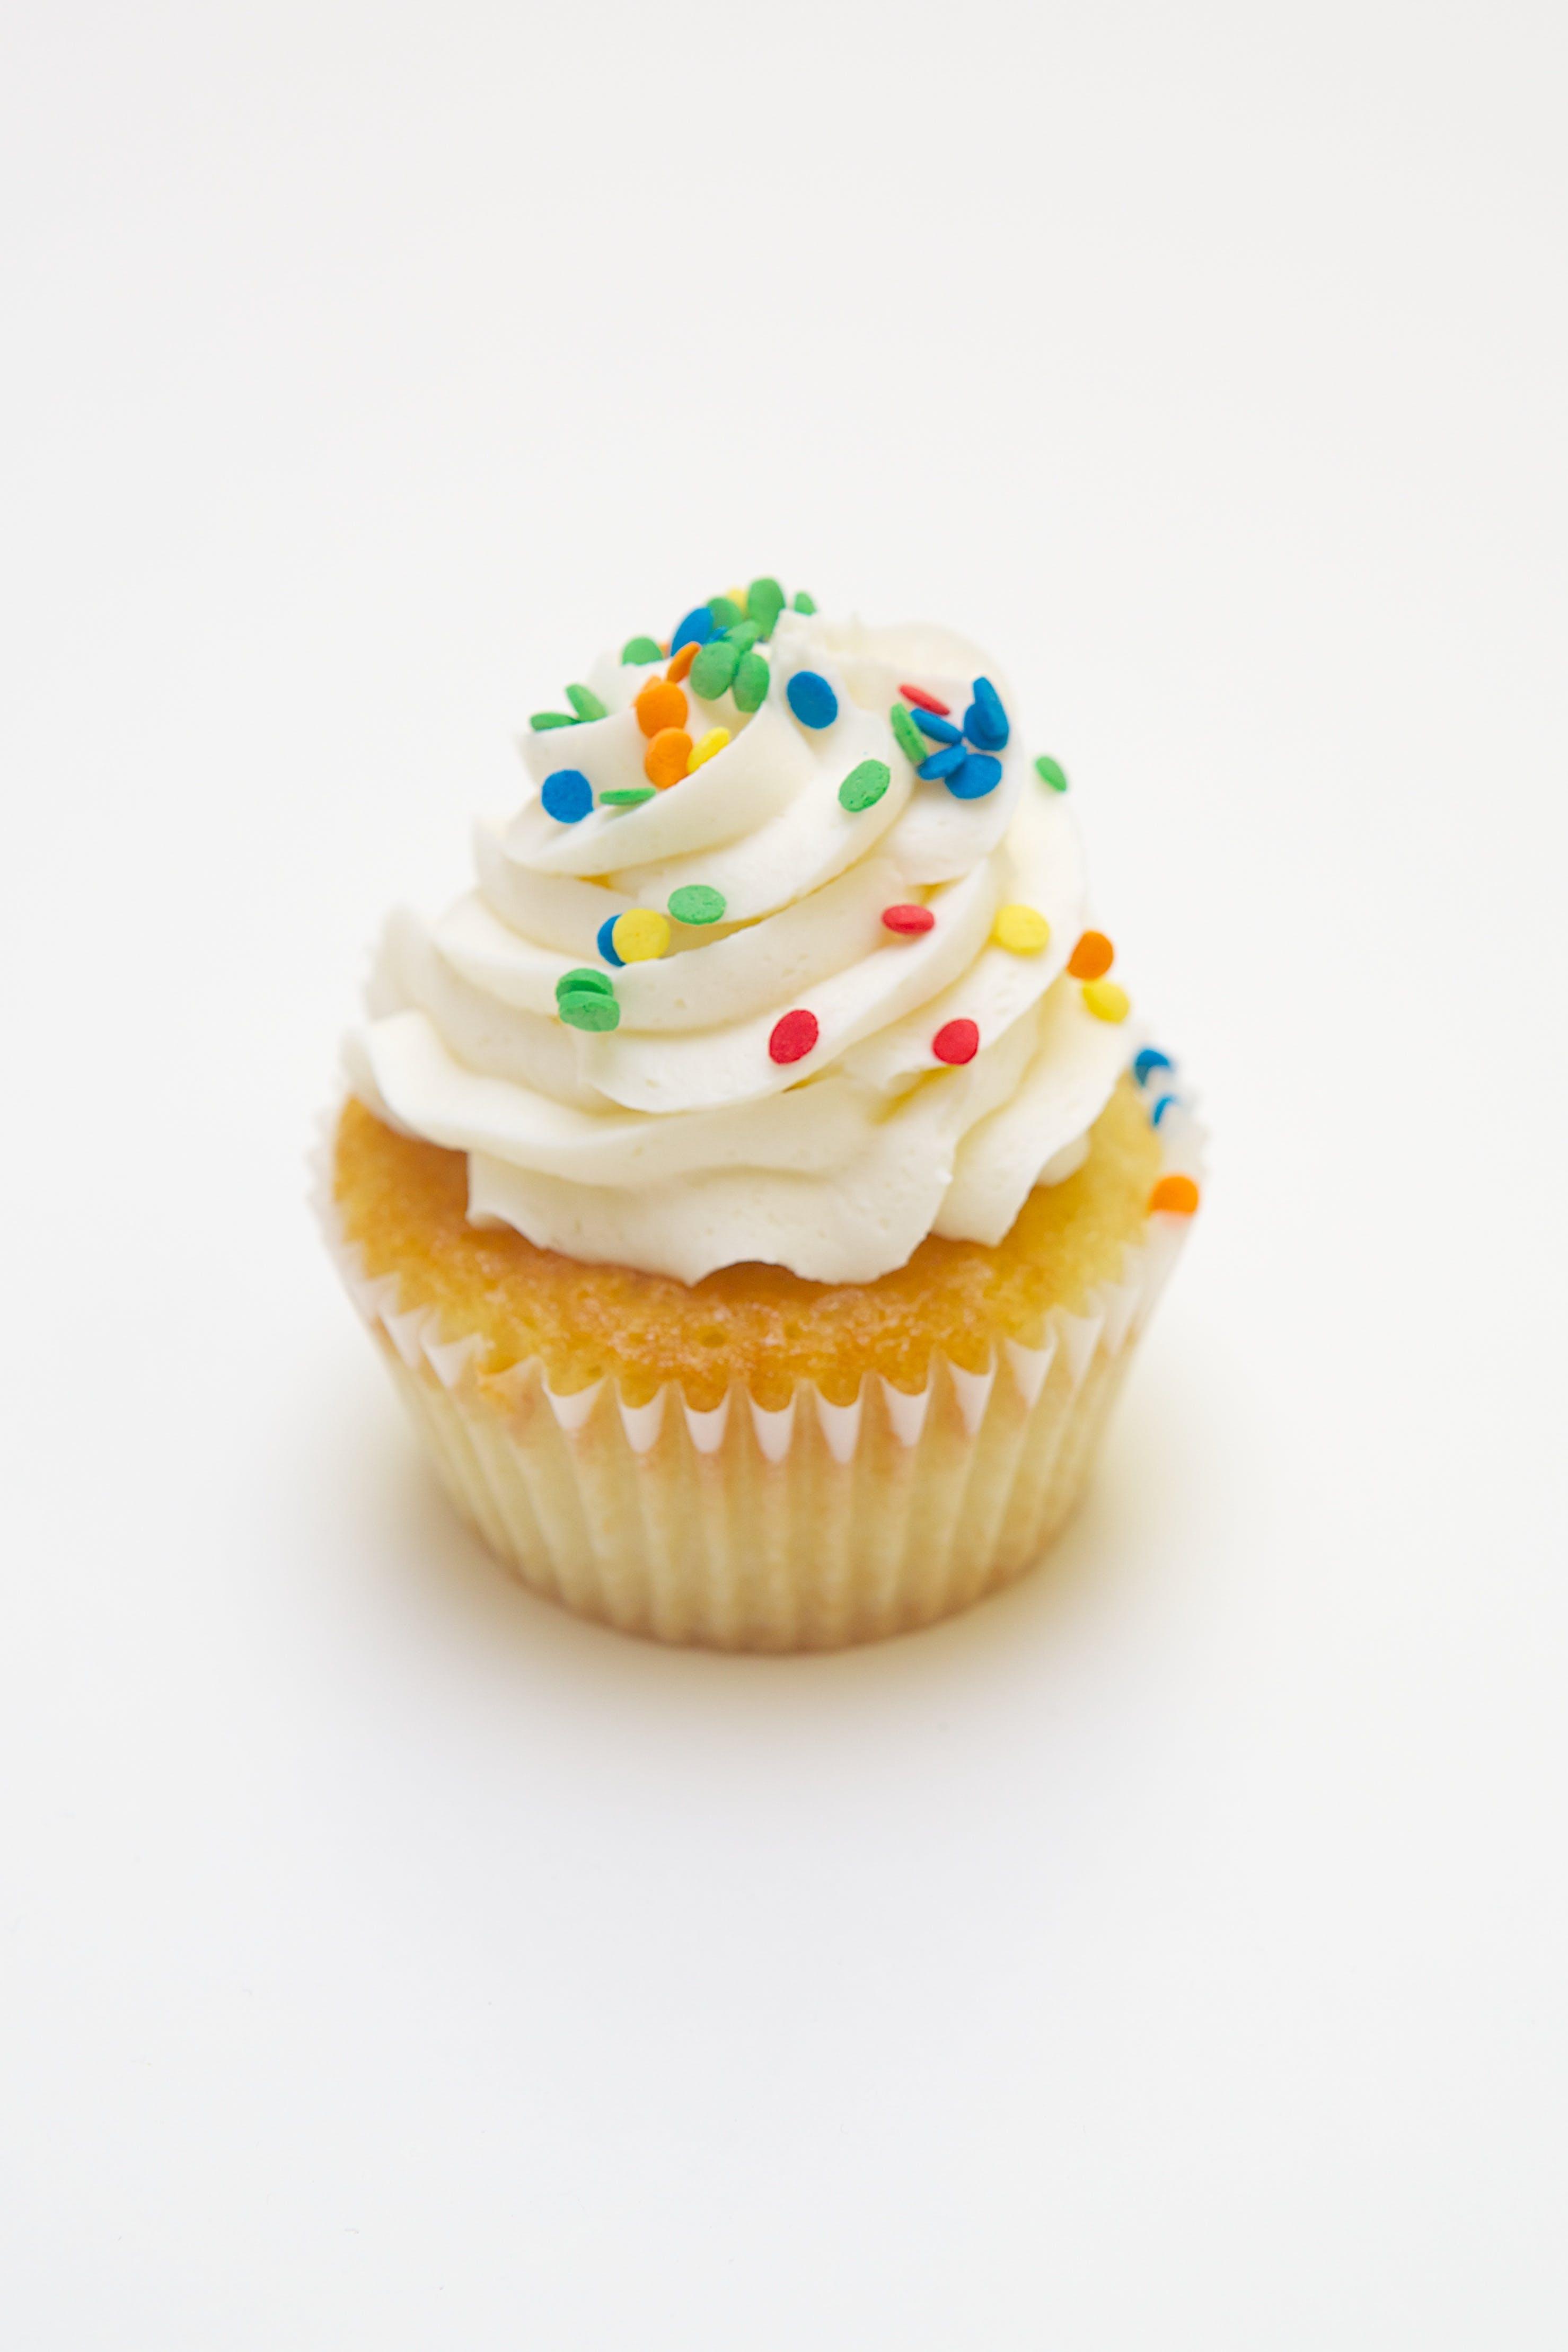 Free stock photo of food, sugar, white, bakery